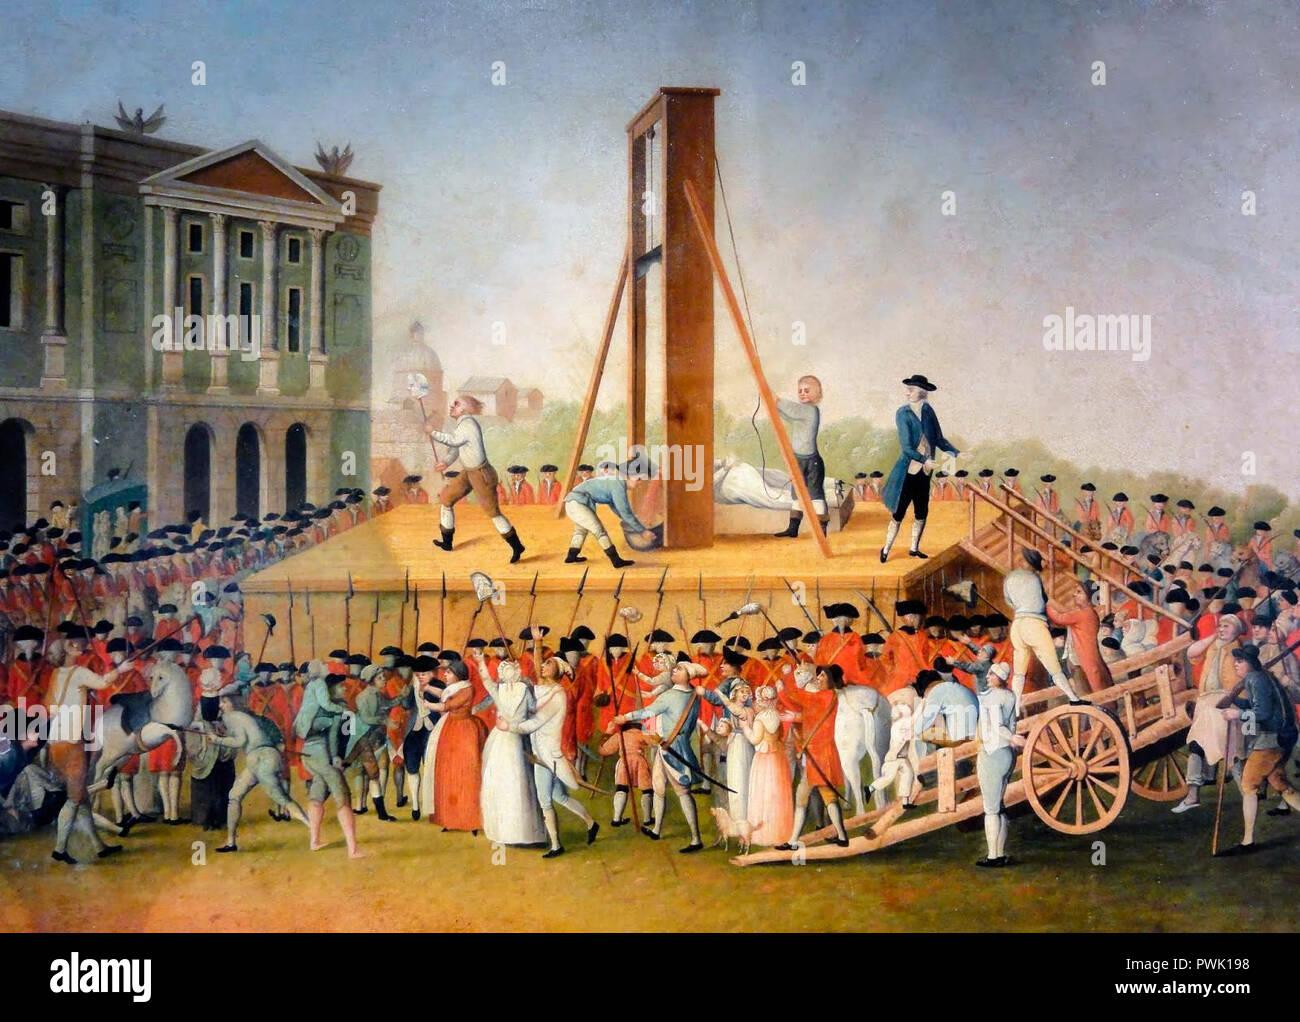 Marie Antoinette's execution in 1793 at the Place de la Révolution - Stock Image